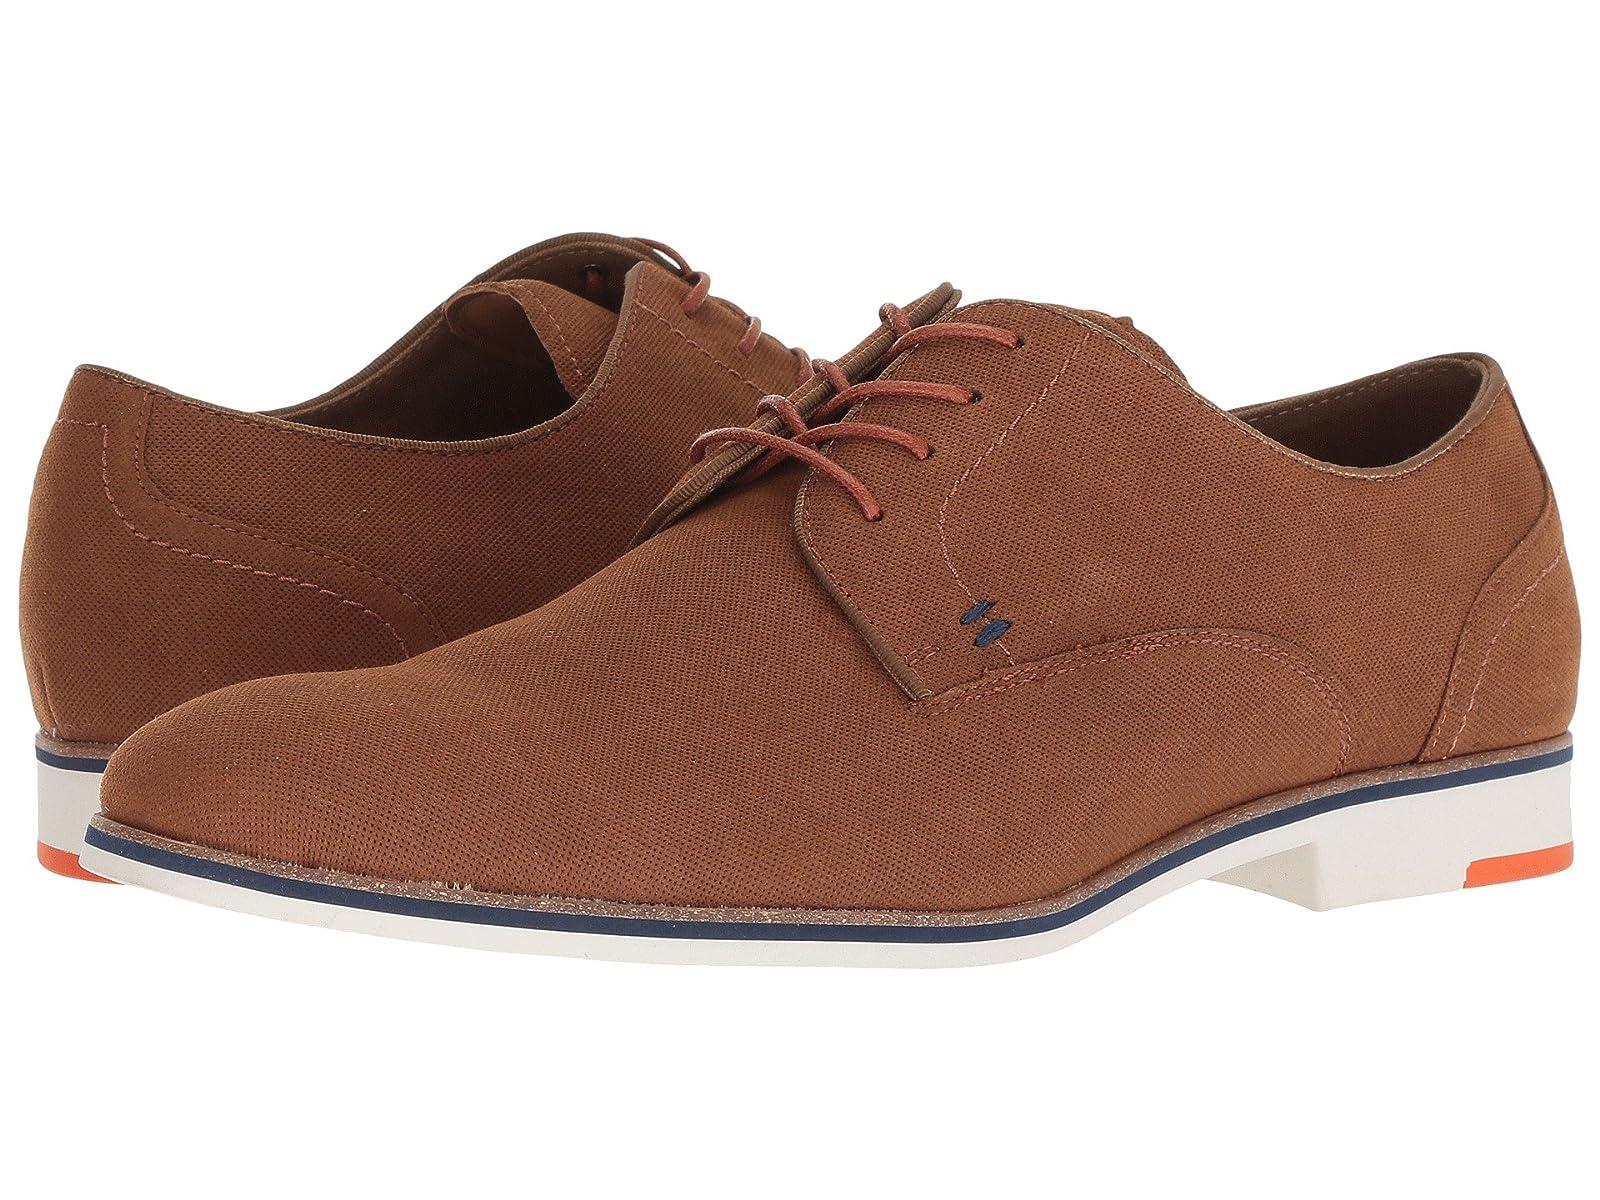 ALDO AdimariCheap and distinctive eye-catching shoes